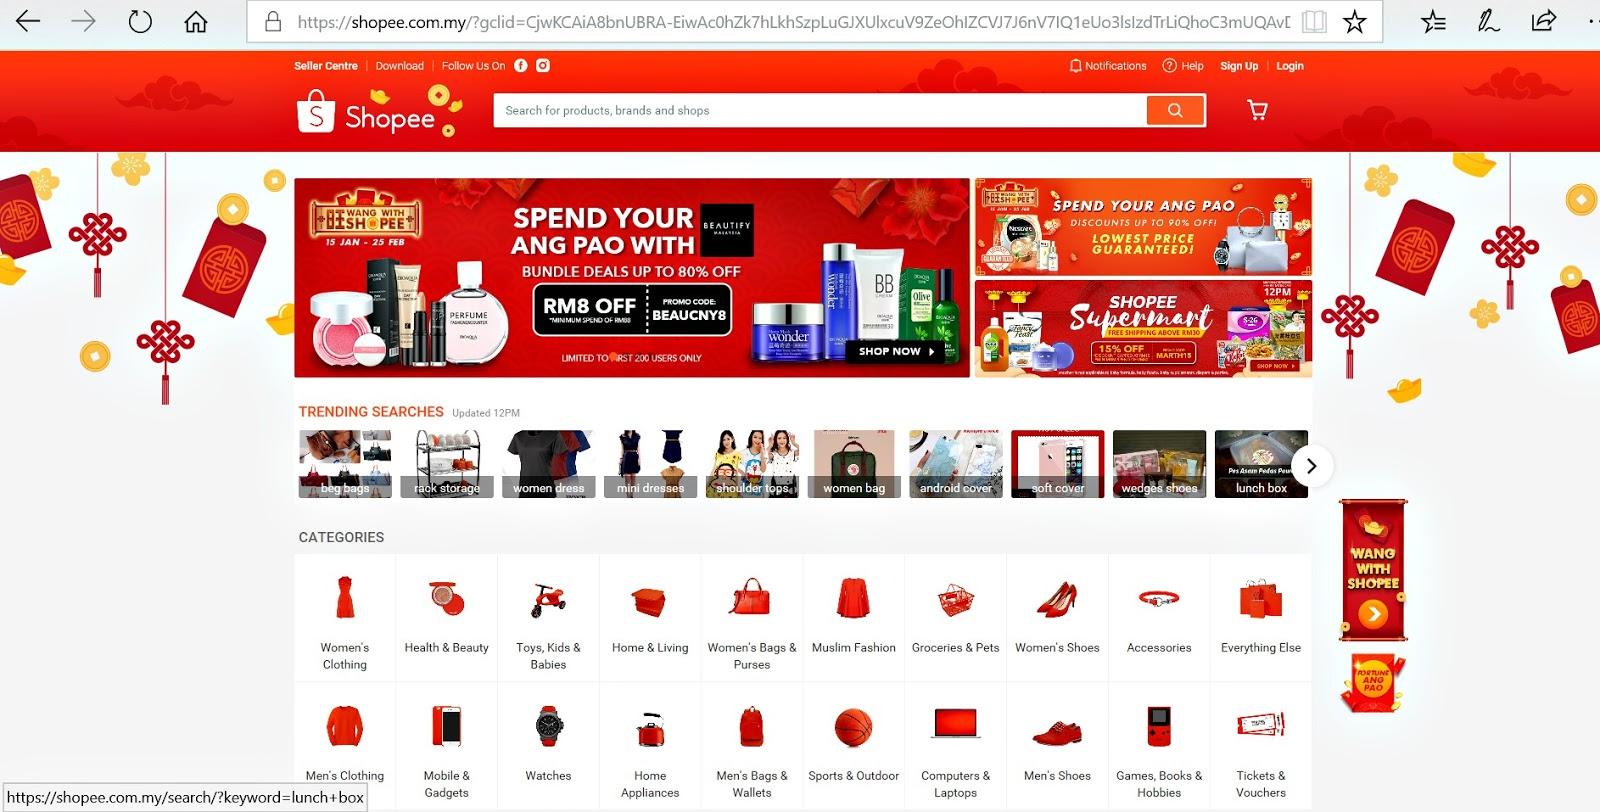 Shopee Malaysia - Shopee Guarantee ~ Online Shopping Fraud